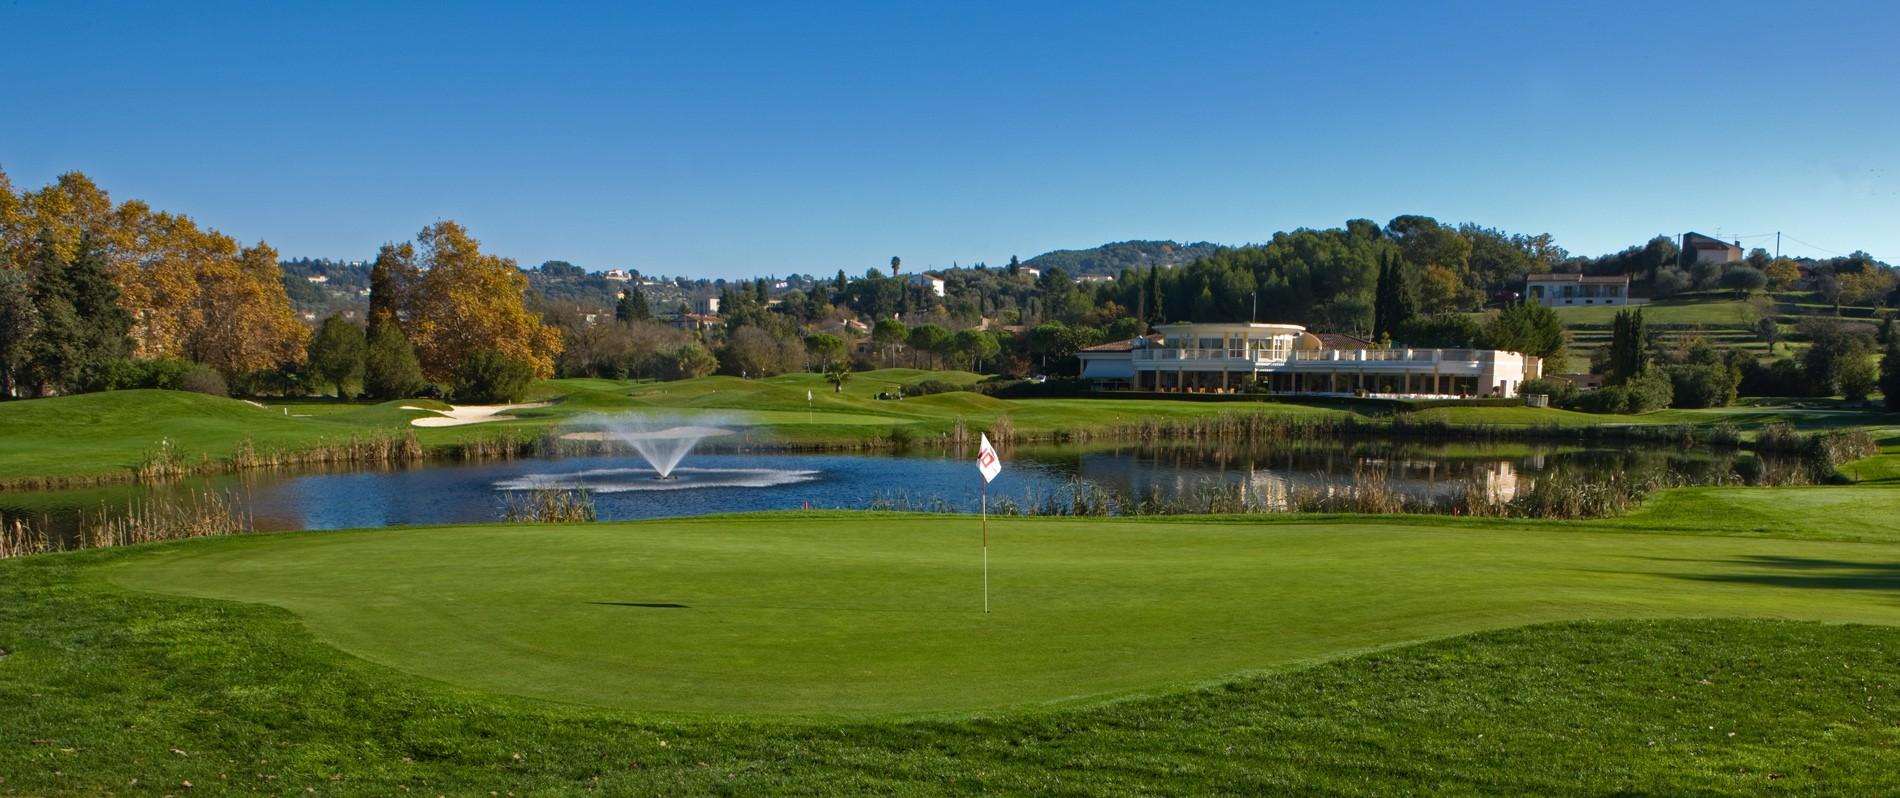 Golf de Saint Donat - Golfclub Grasse